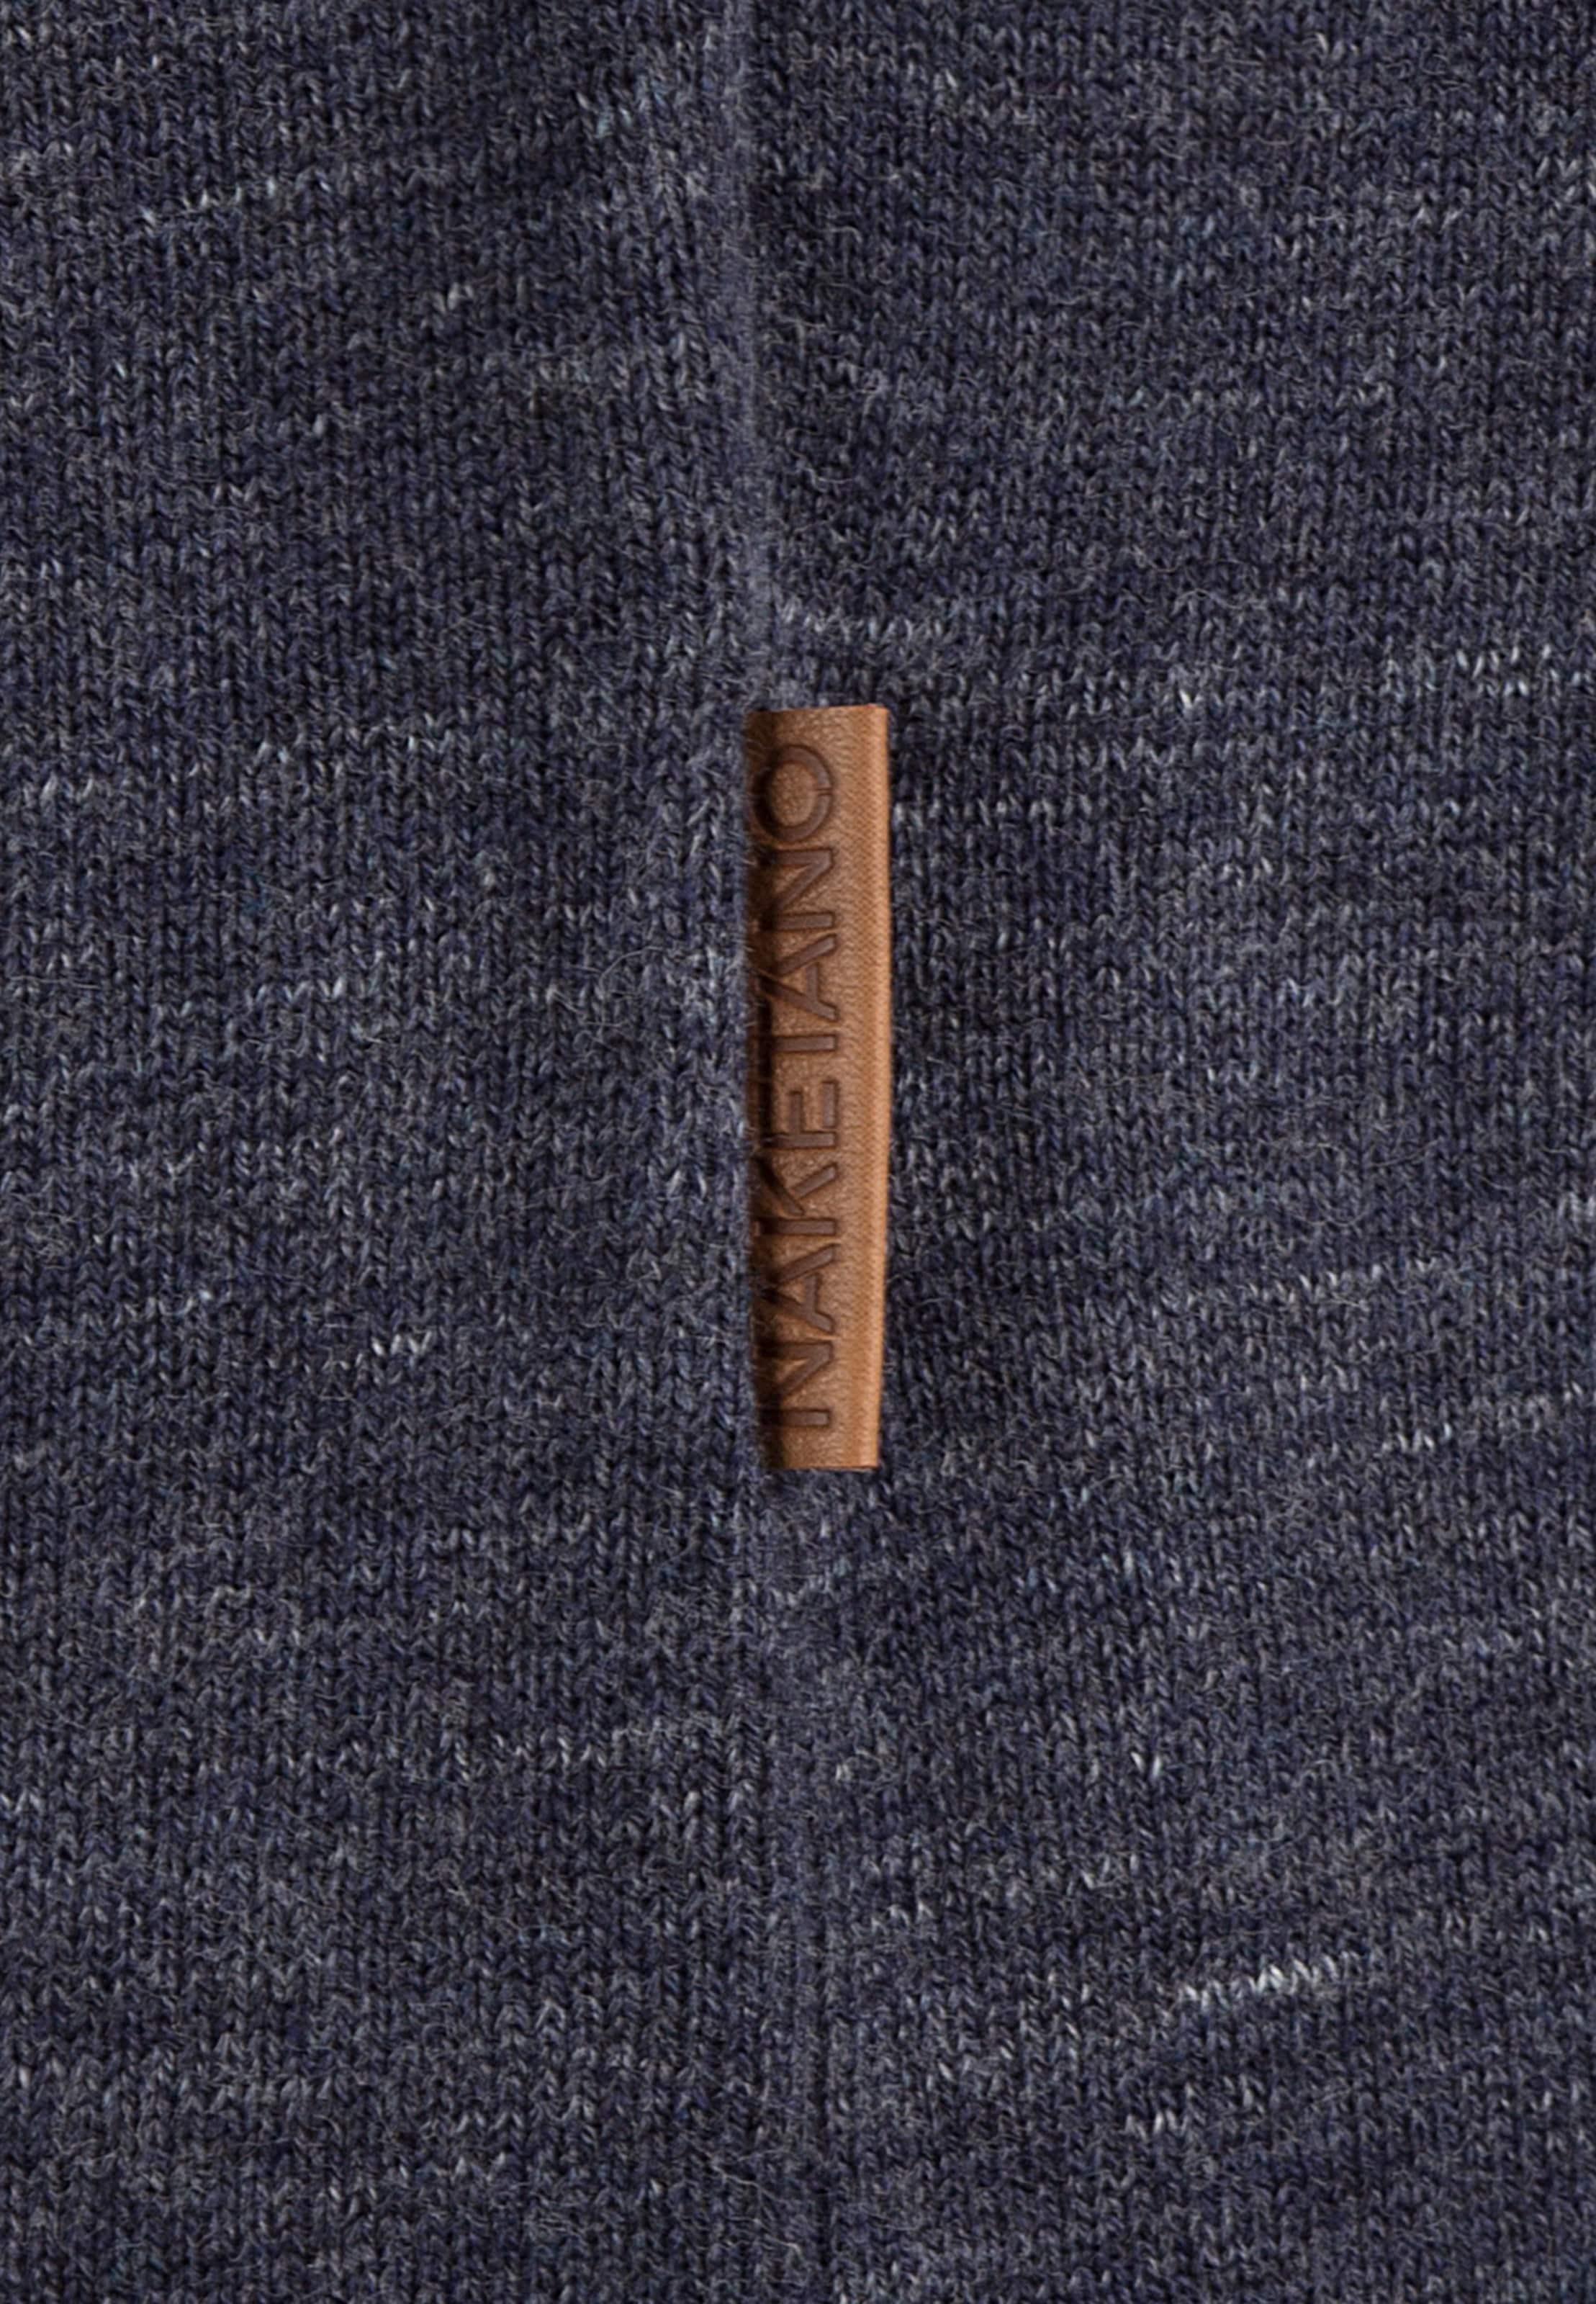 naketano Male Knit MDMA macht aha Billig Vermarktbare j5tTo